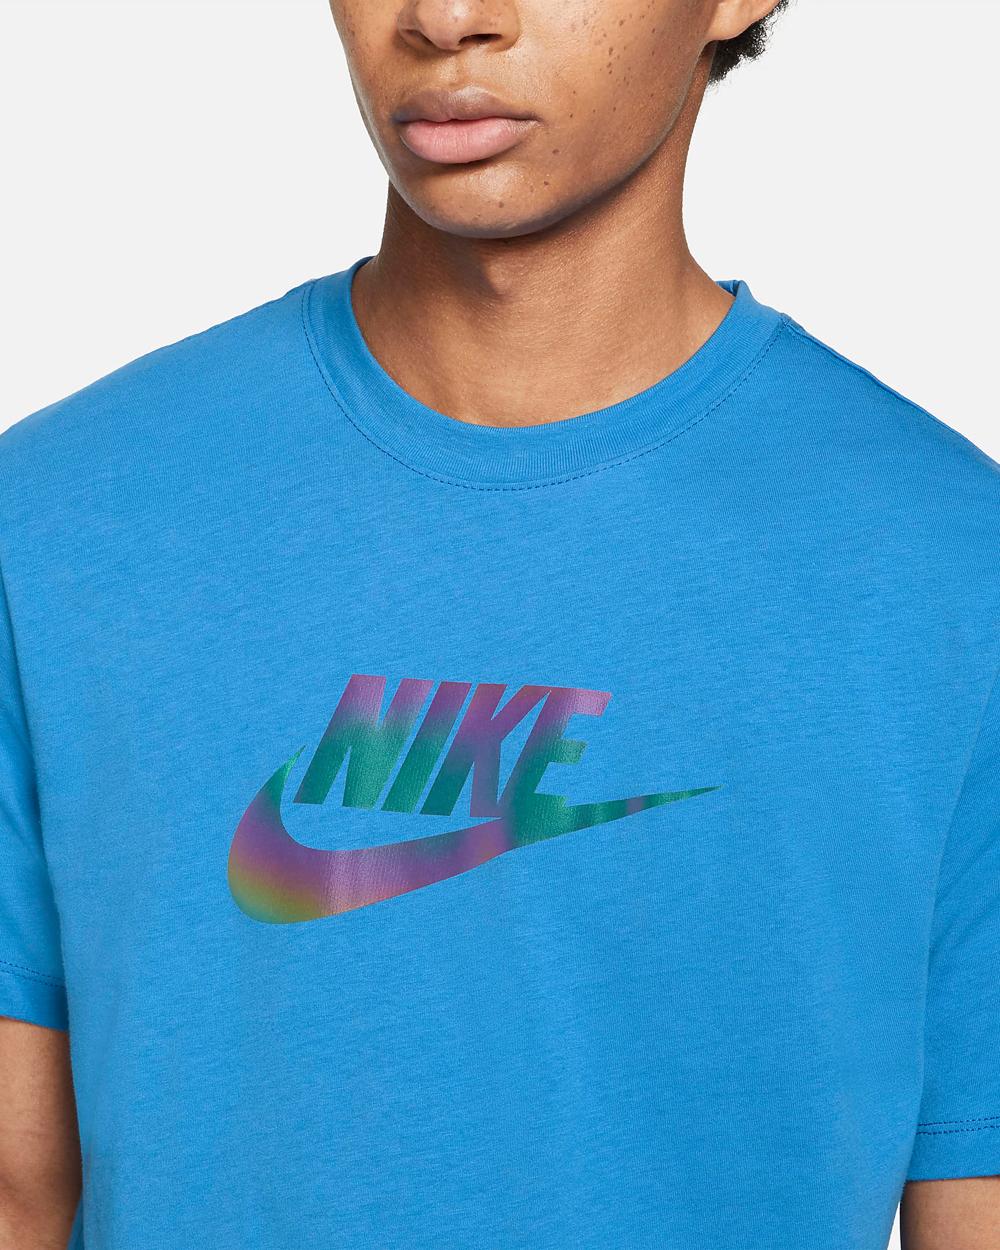 nike-iridescent-shirt-blue-1